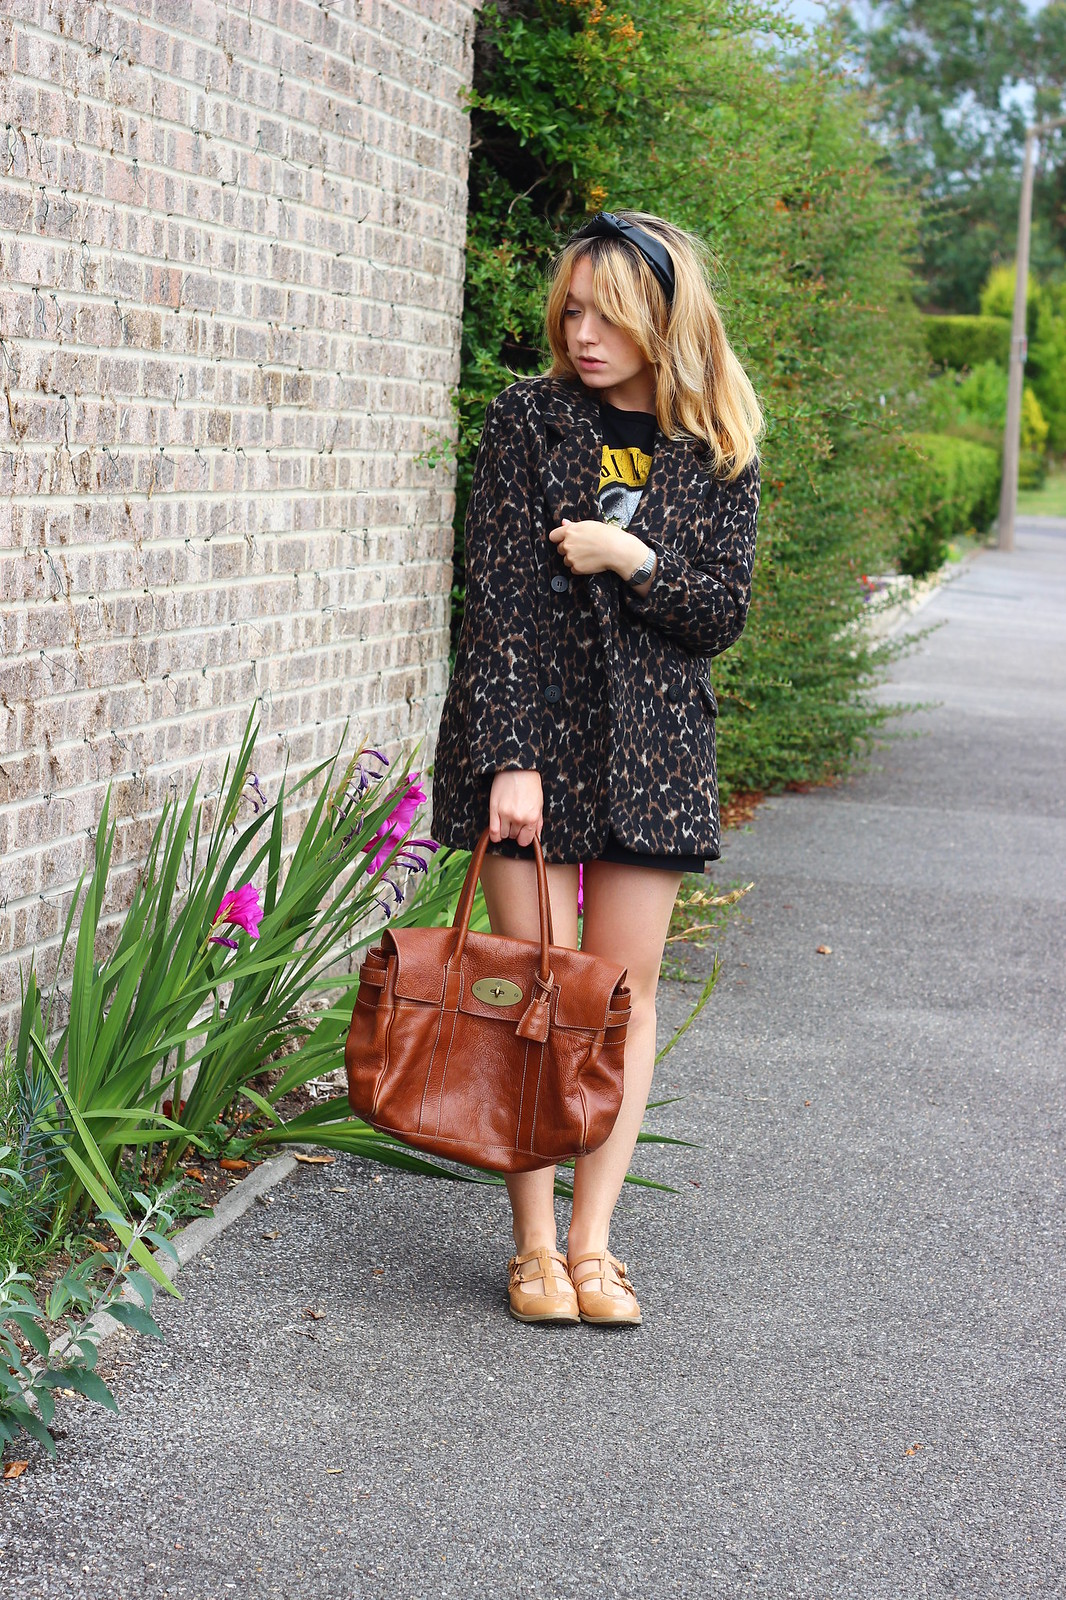 3leopardprintjacket, leopard print jacket h&m, outfit, retro, style